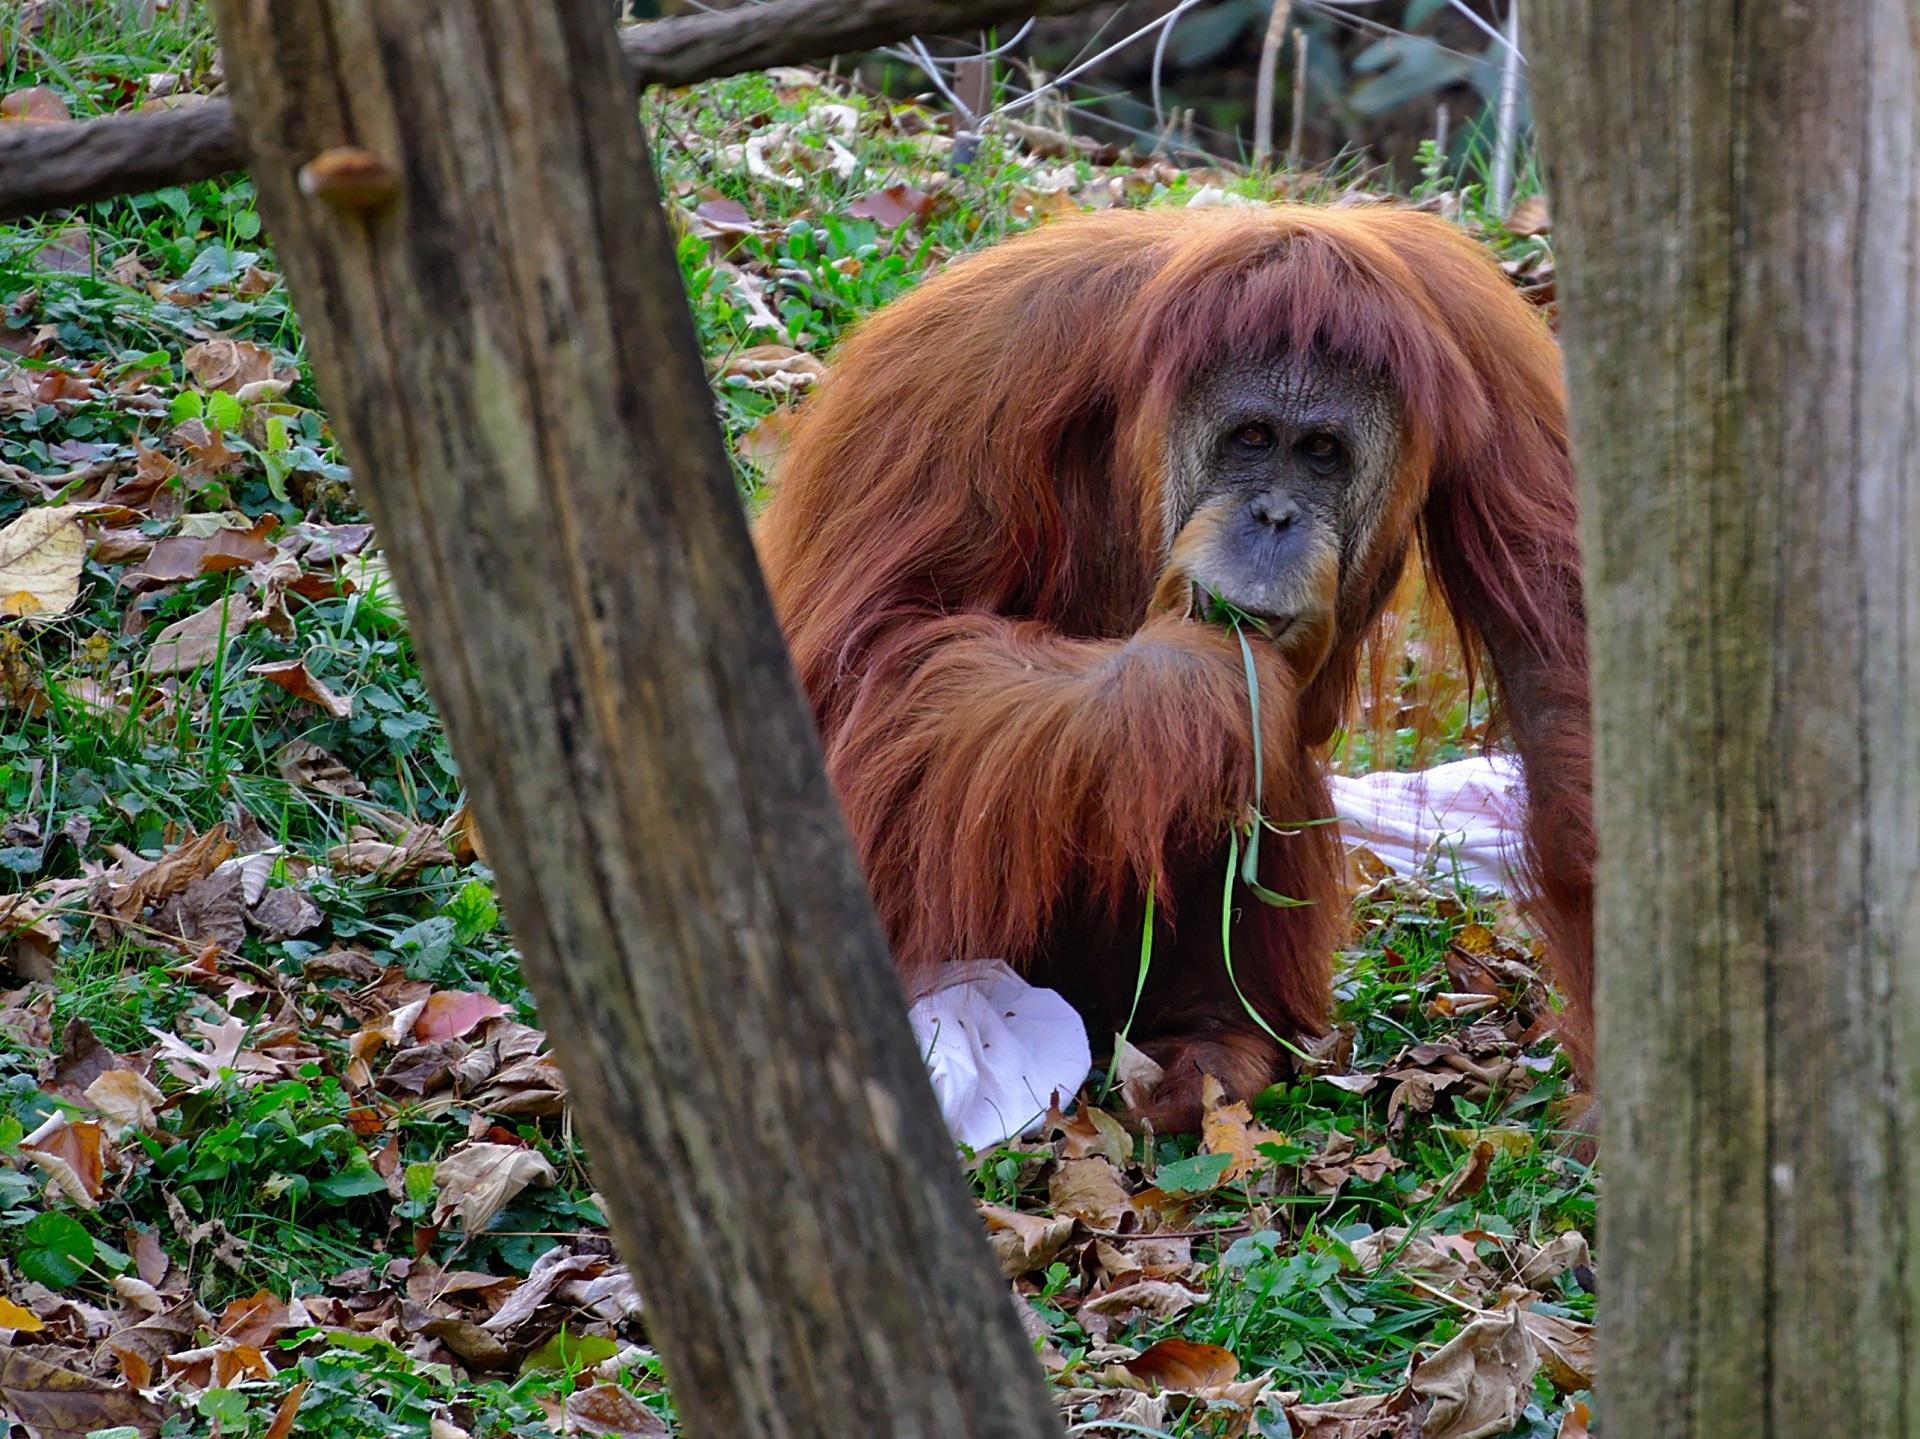 Wild Orangutang, Animal, Jungle, Monkey, Nature, HQ Photo